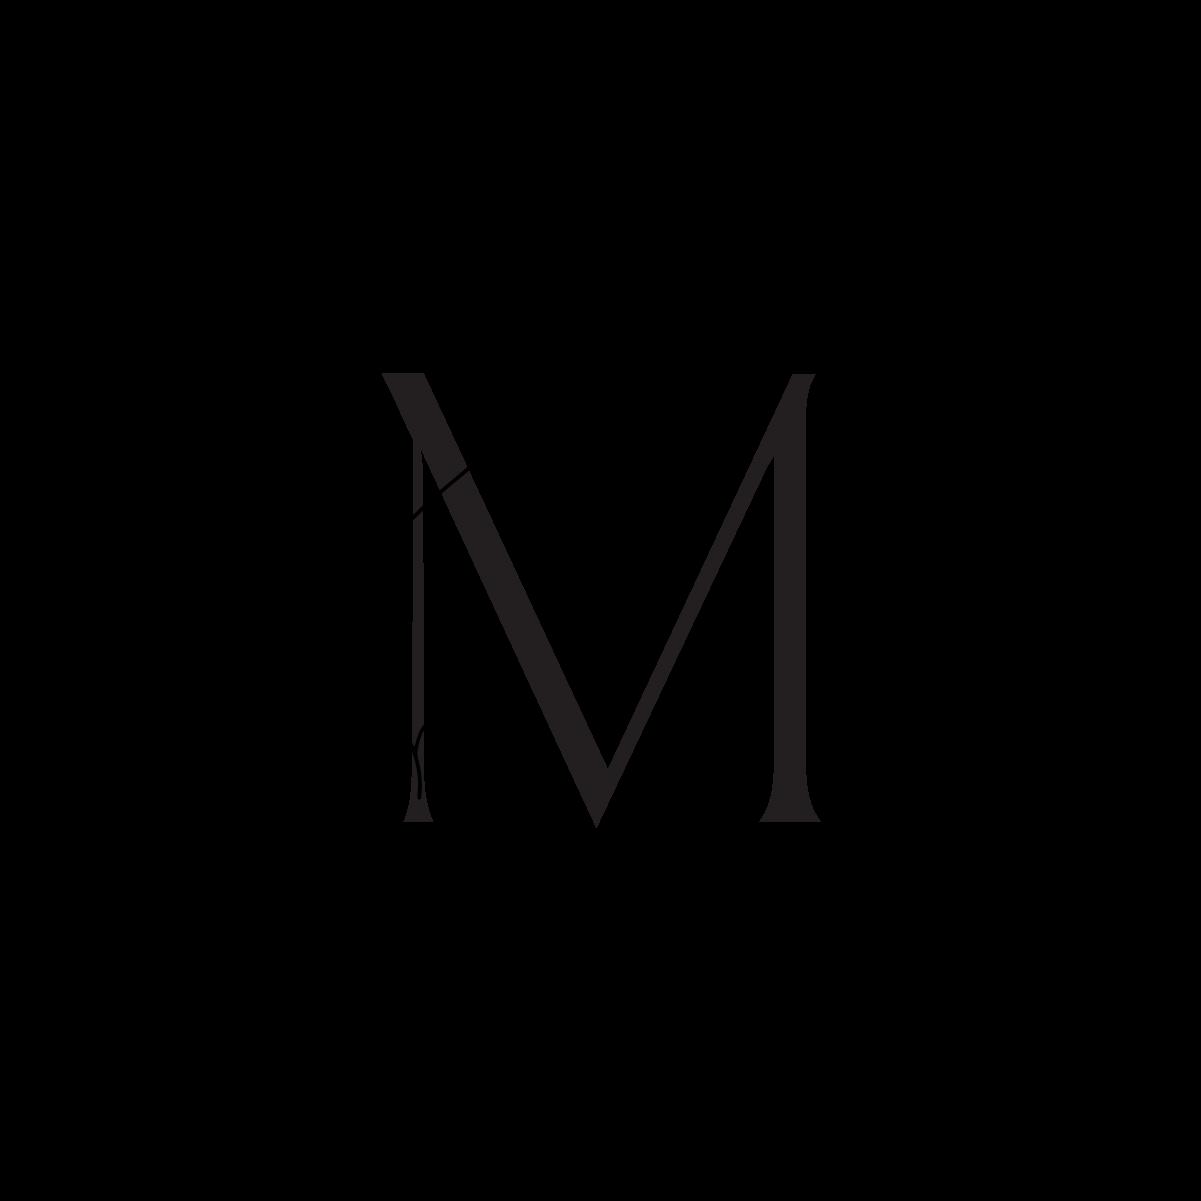 Meristem-Submark-Black (1).png